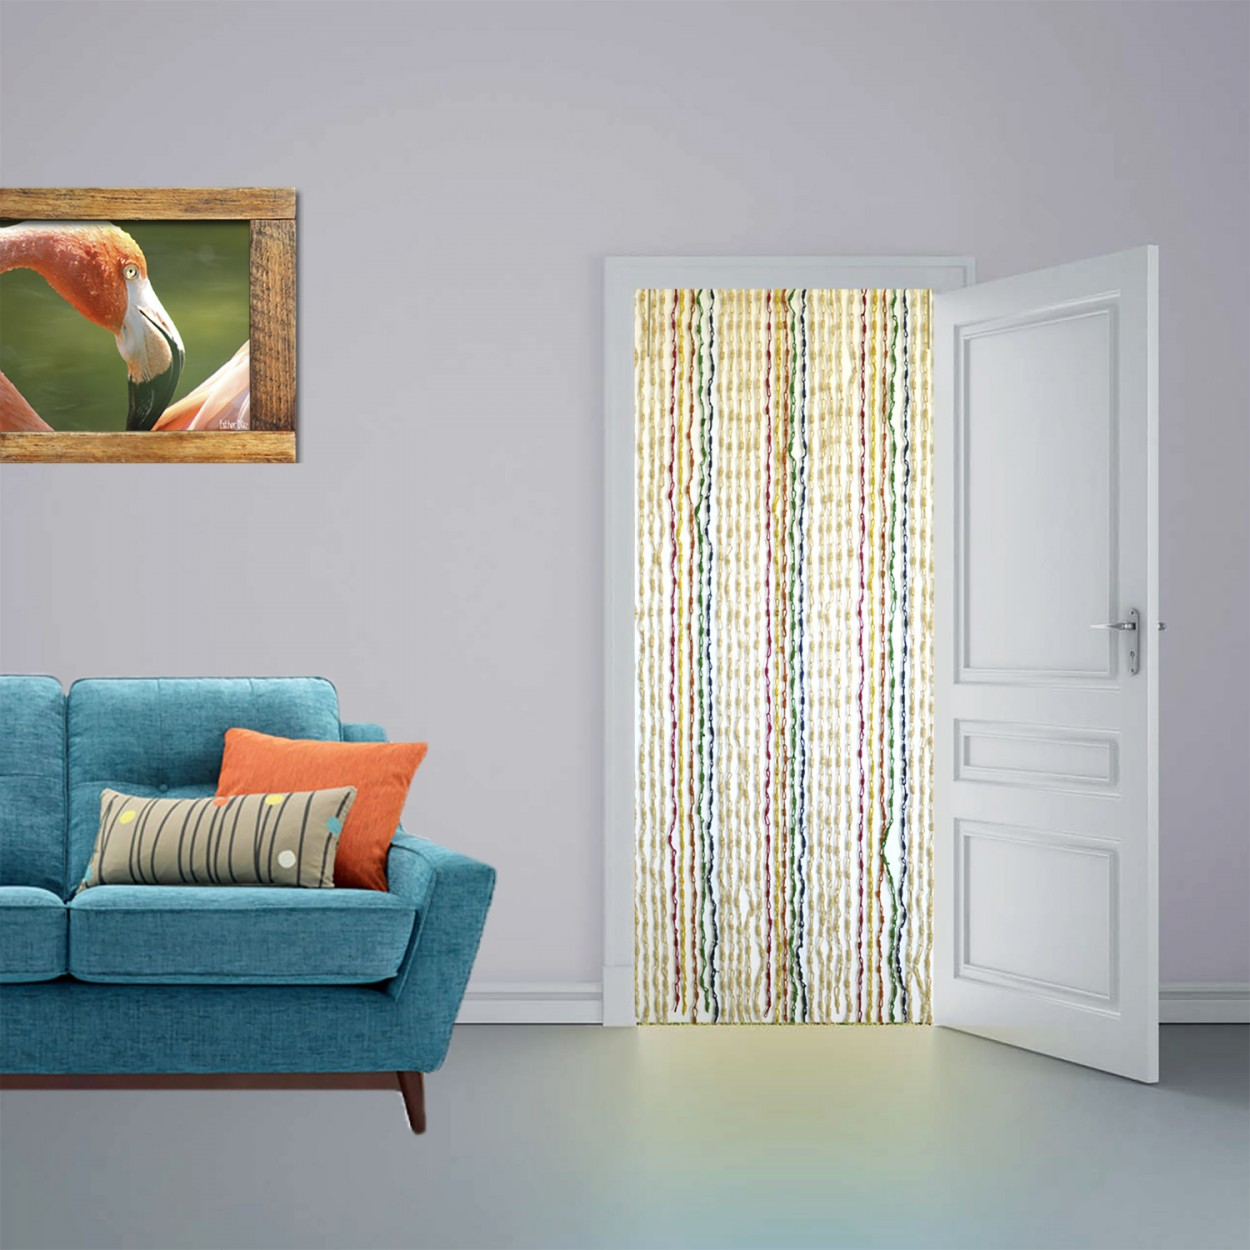 Cortina para puerta sisal natural y madera de colores for Cortinas de madera para puertas